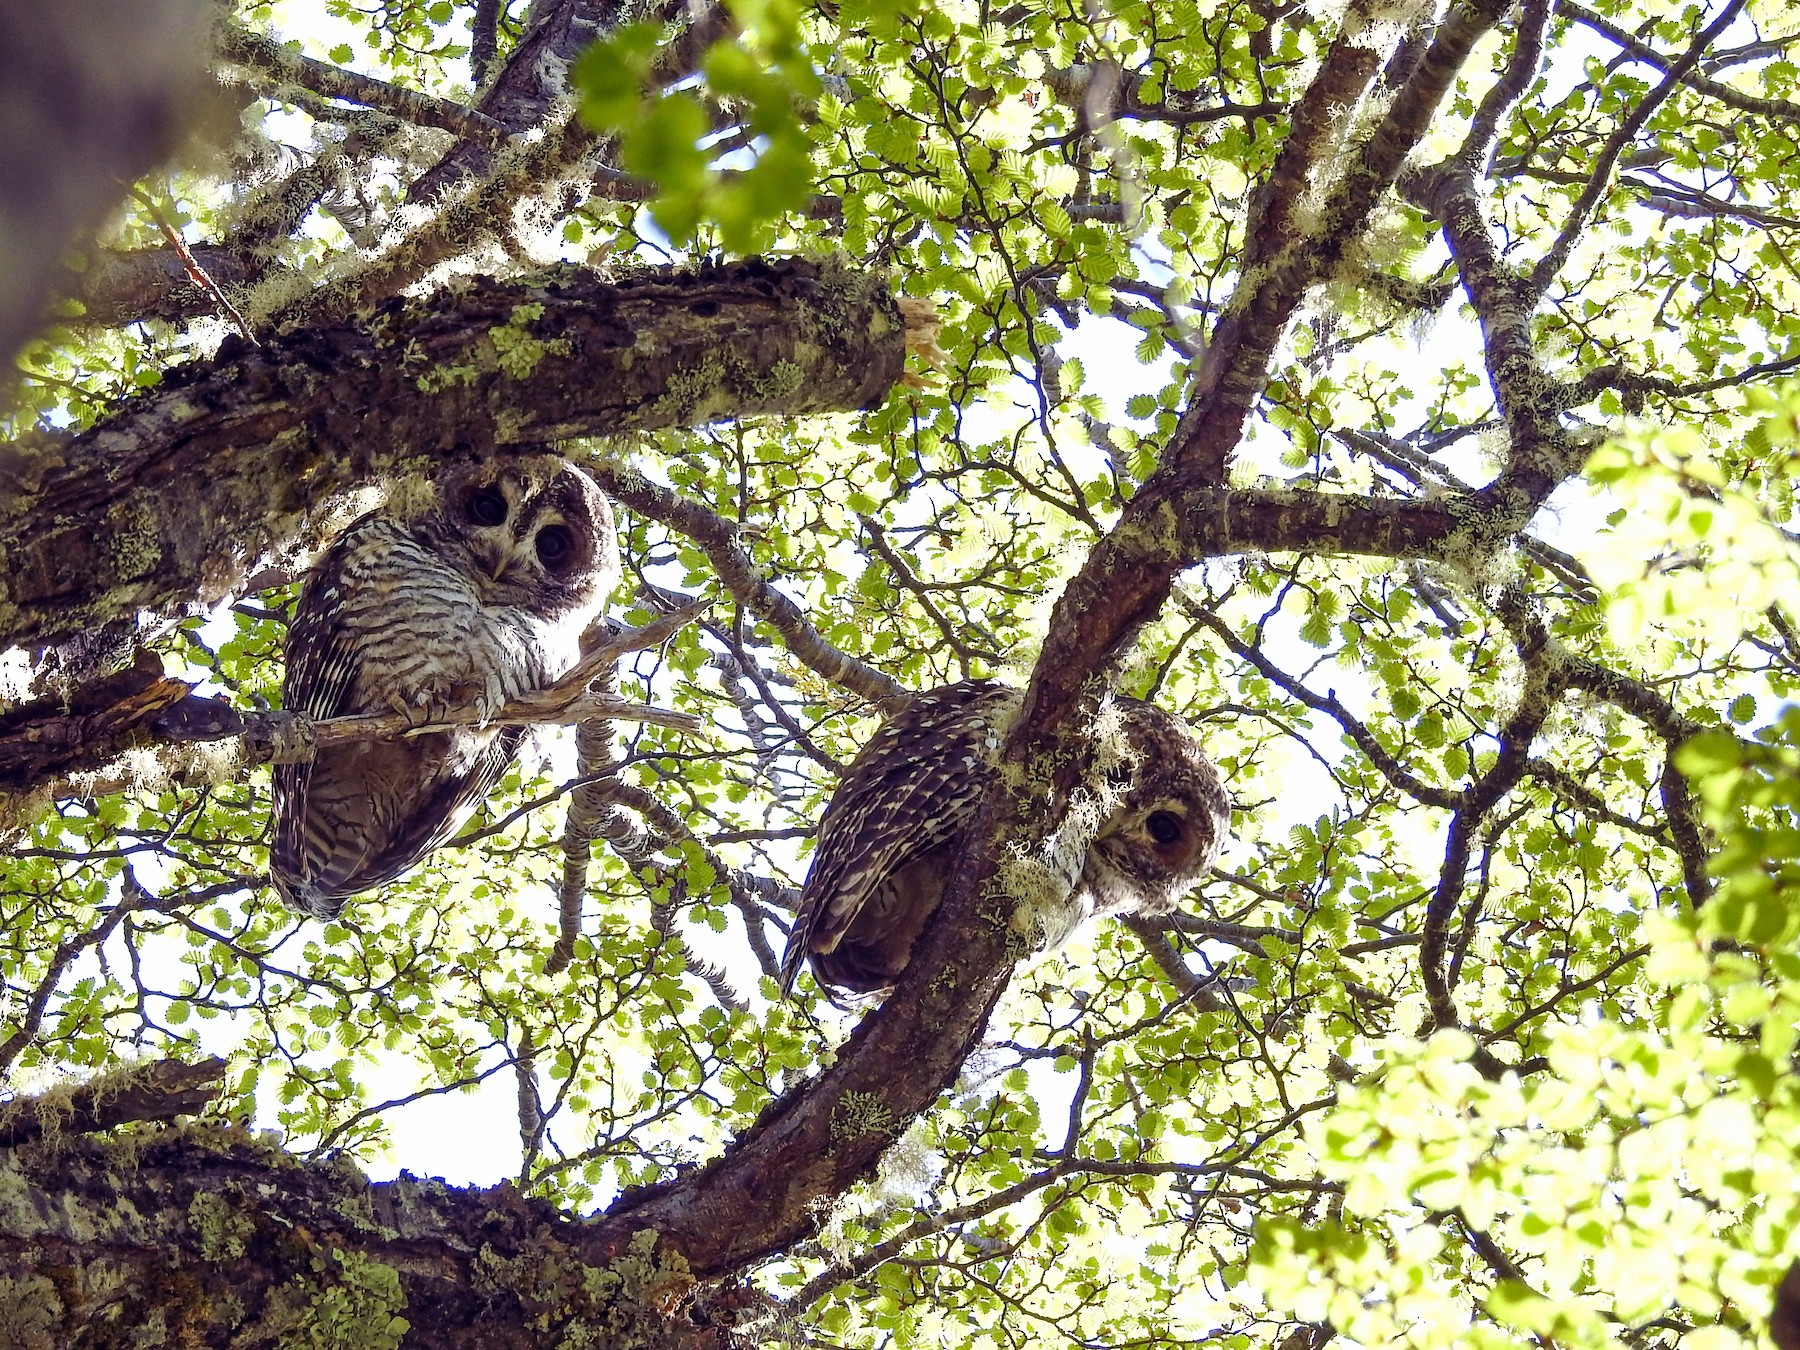 Rufous-legged Owl - jorge chamia